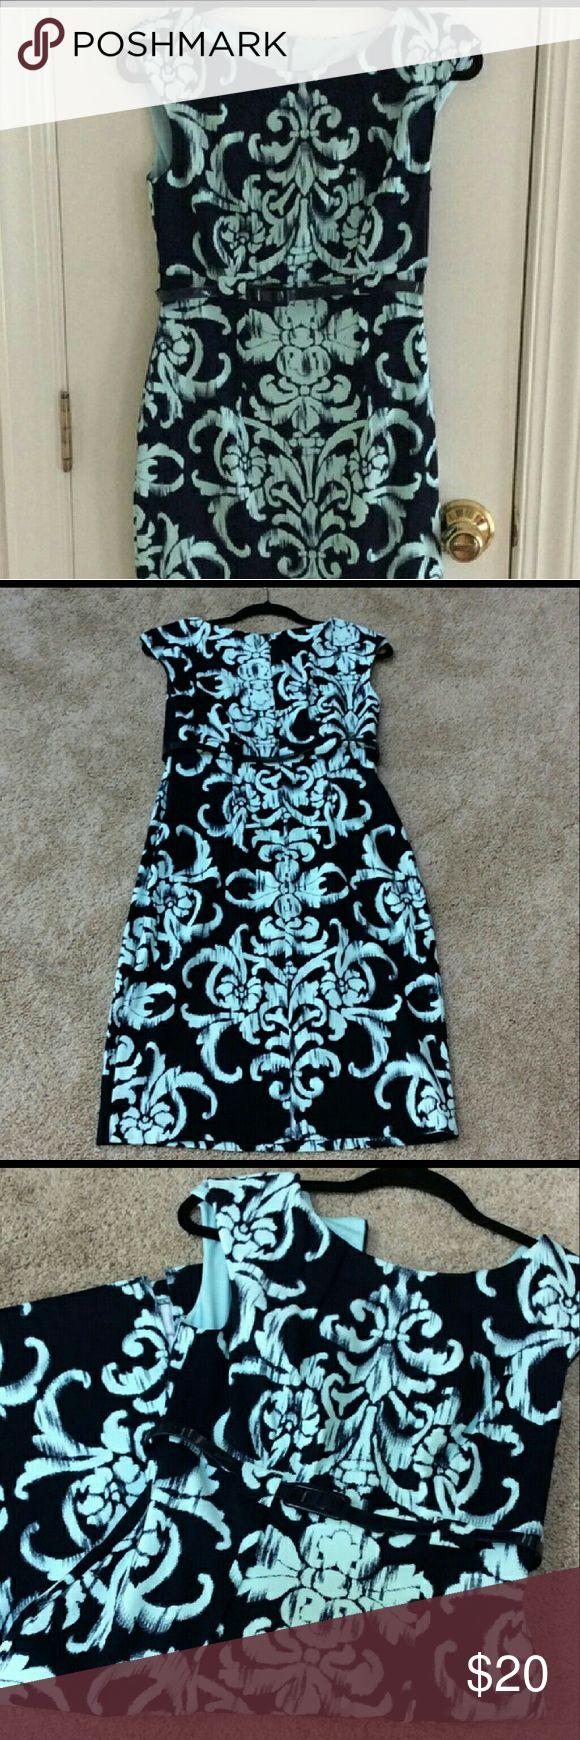 Dress Lovely aqua and navy career, church, dinner dress. Very chic!! Worn once! Dress Barn Dresses